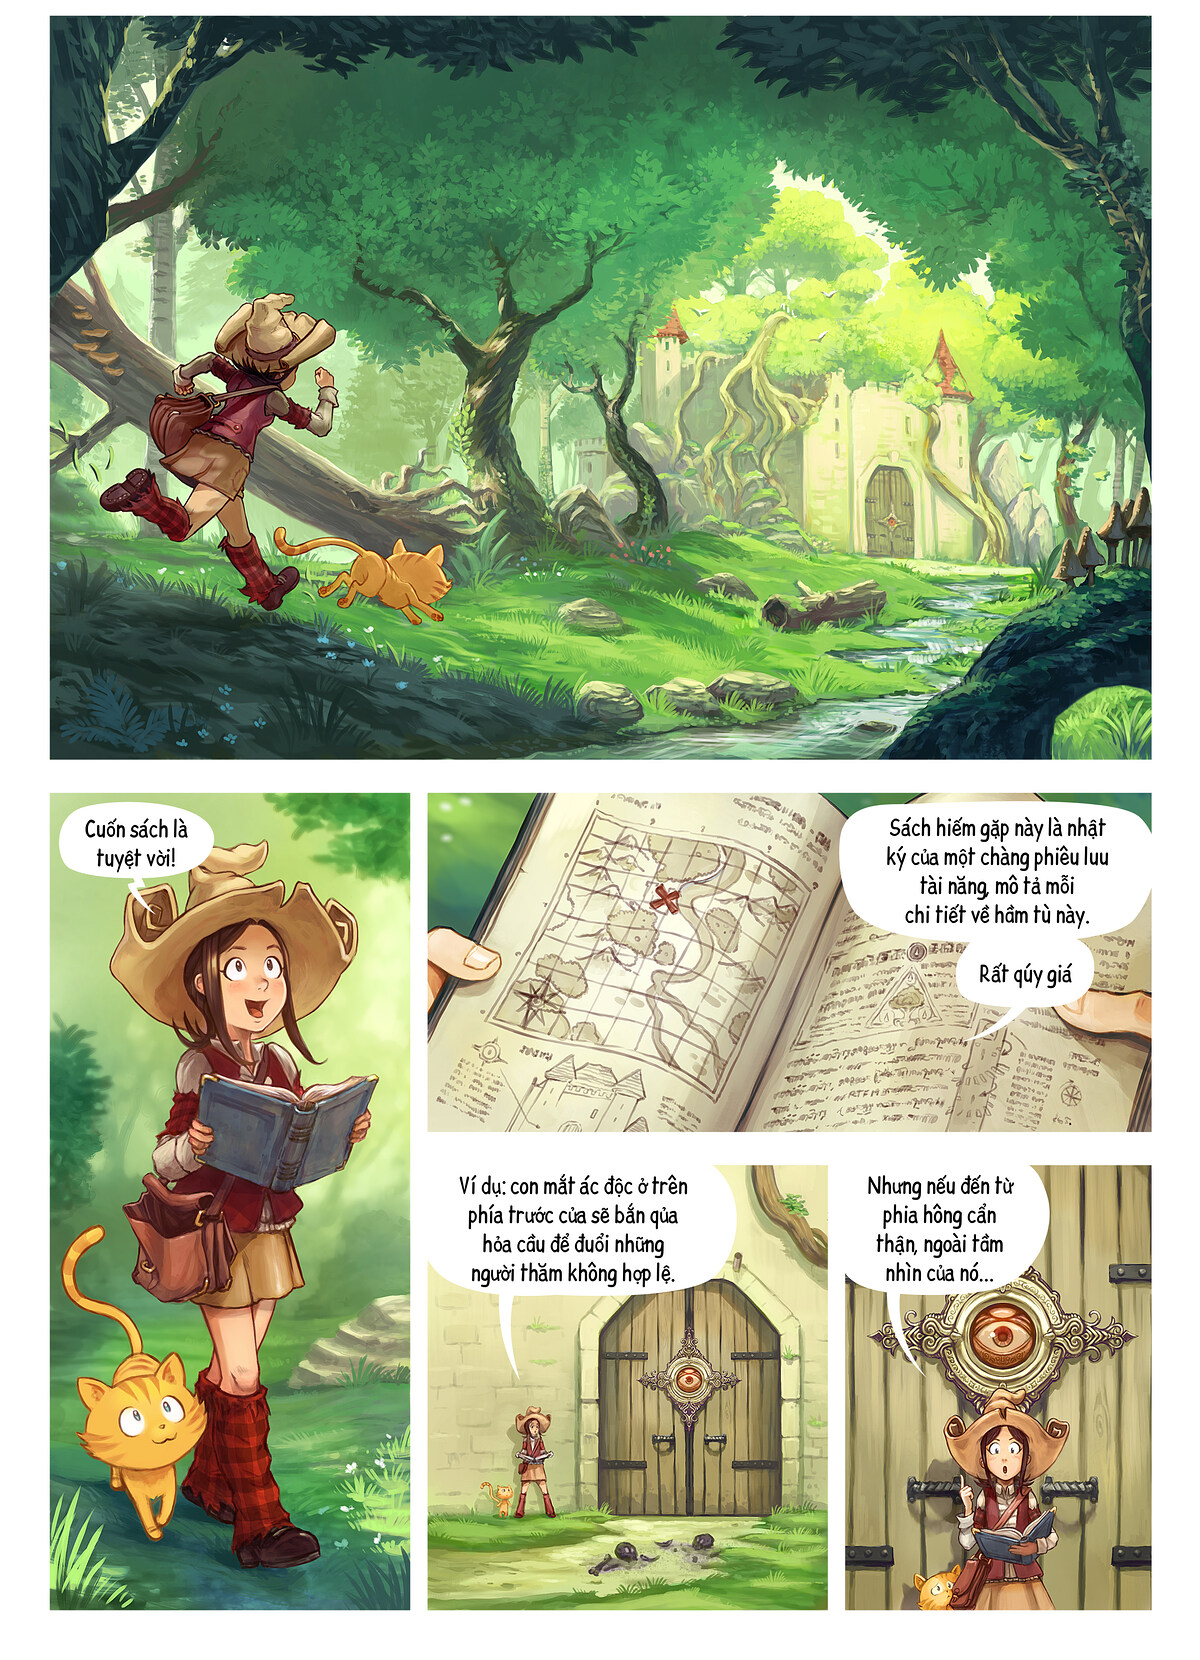 A webcomic page of Pepper&Carrot, Tập 26 [vi], trang 1